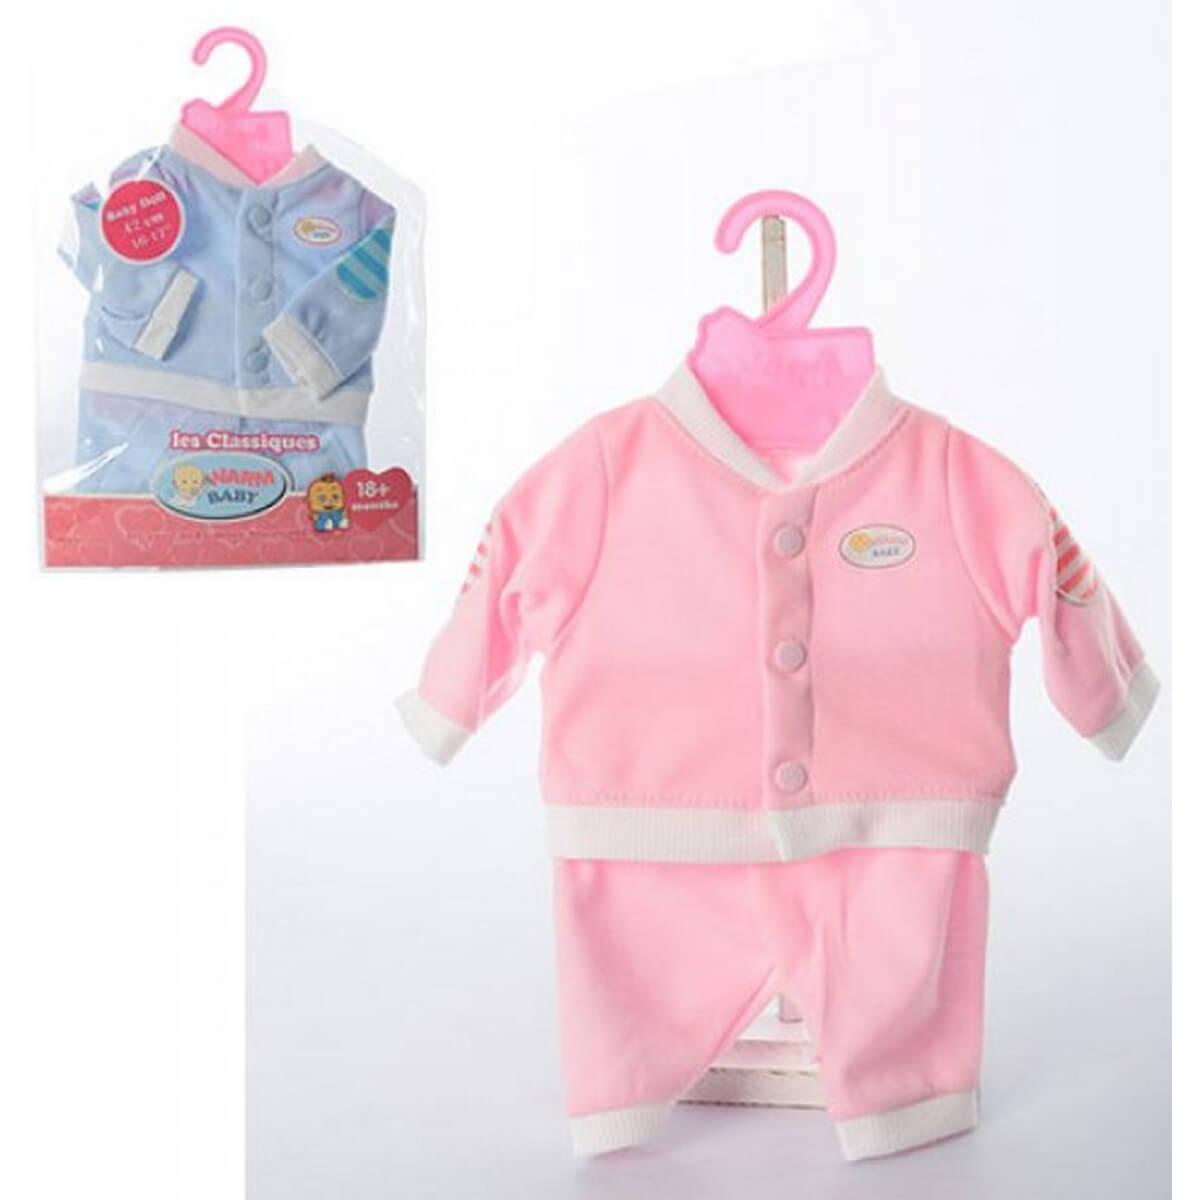 baby doll Одежда для пупса 2 вида BJ-421AB